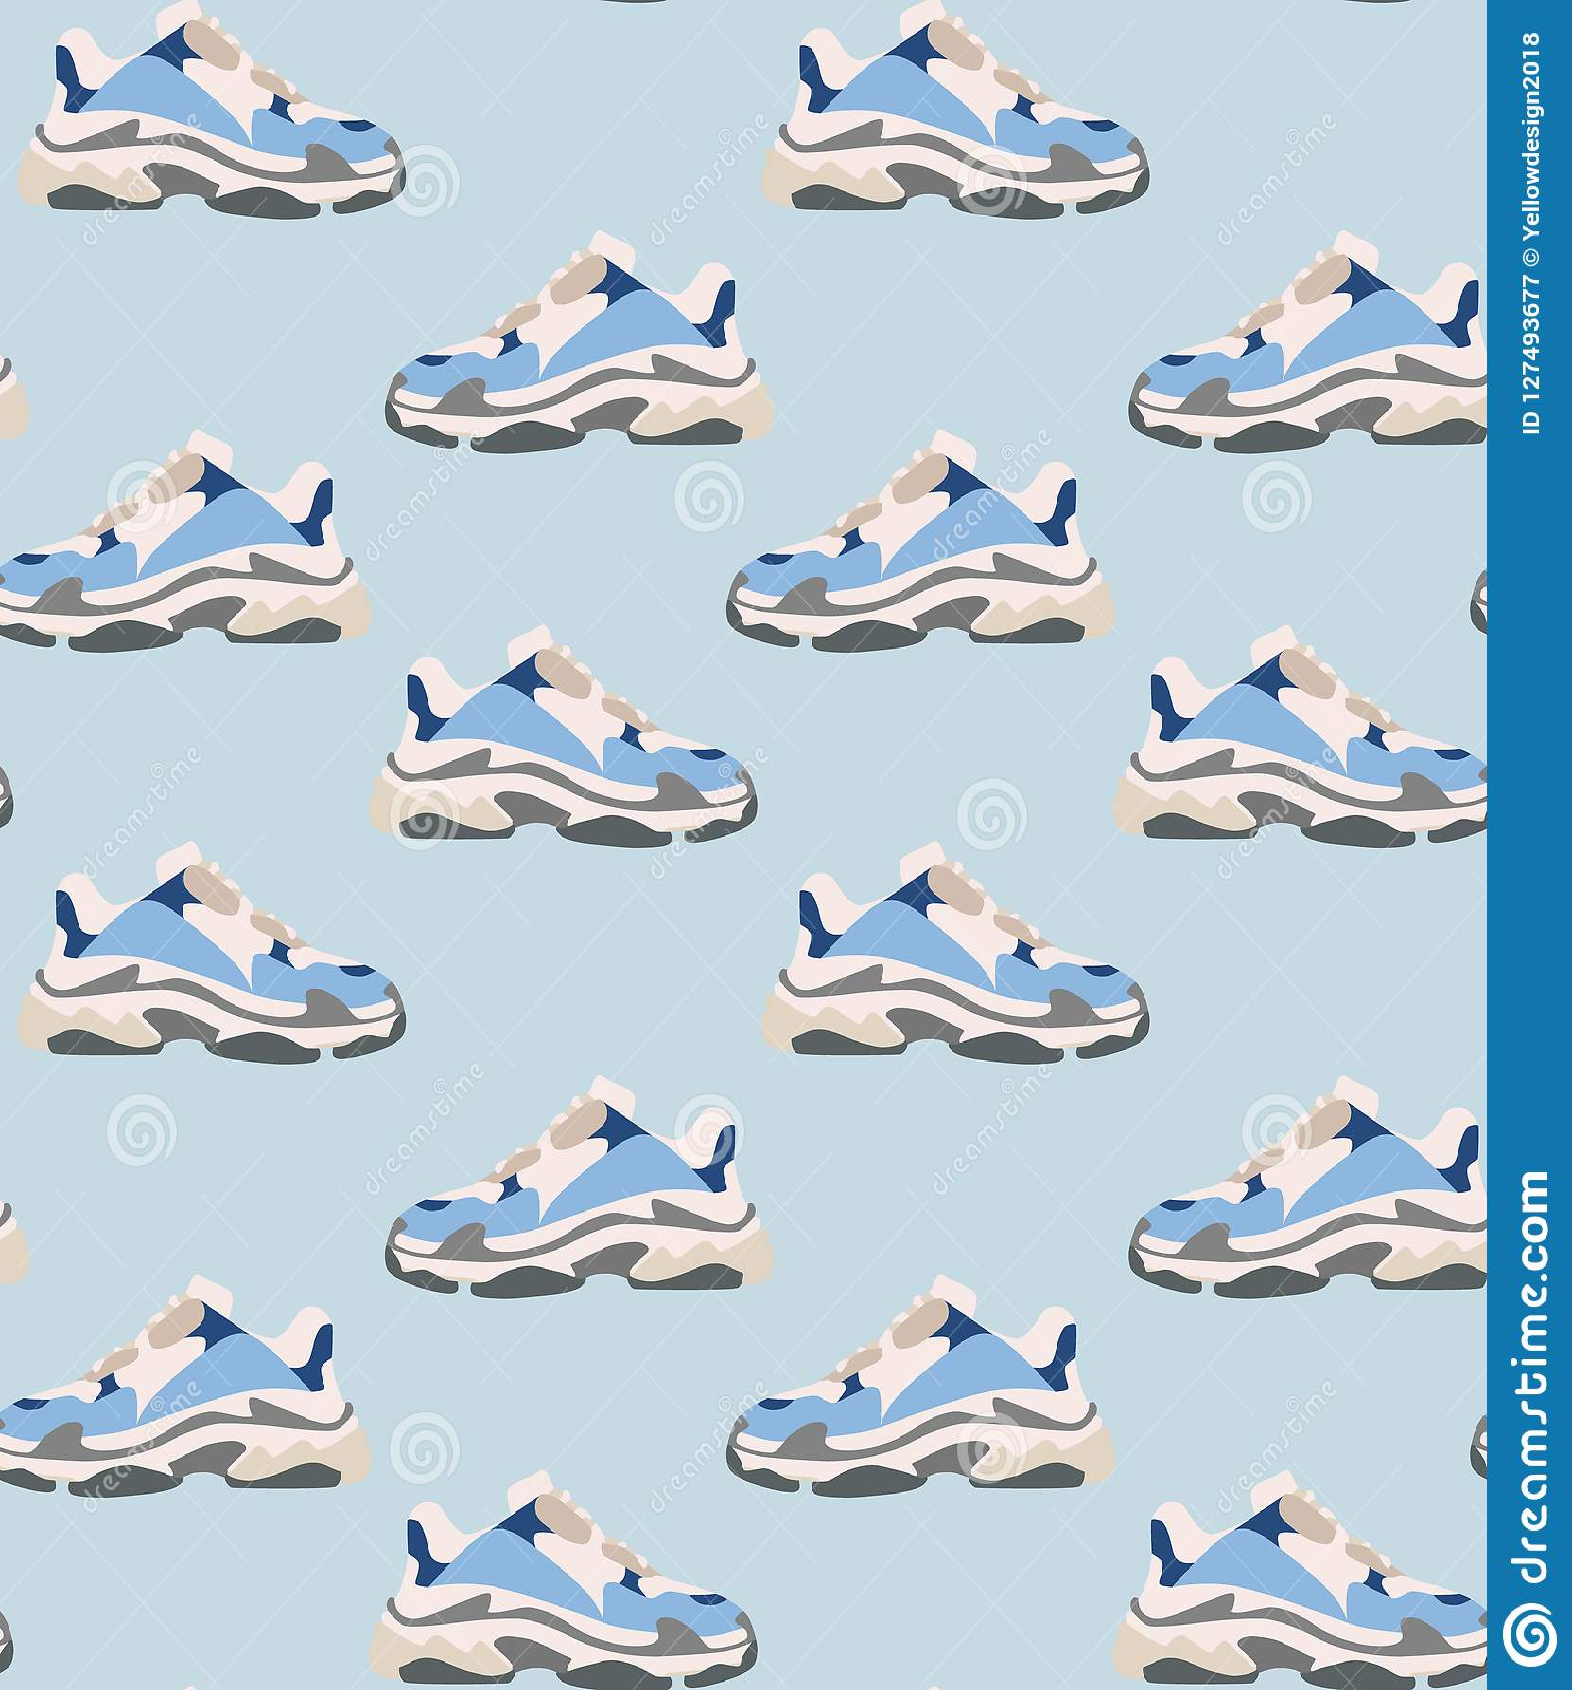 ddd09ce2e49 Άνευ ραφής σχέδιο παπουτσιών πάνινων παπουτσιών Μόδα έννοιας Επίπεδο ...